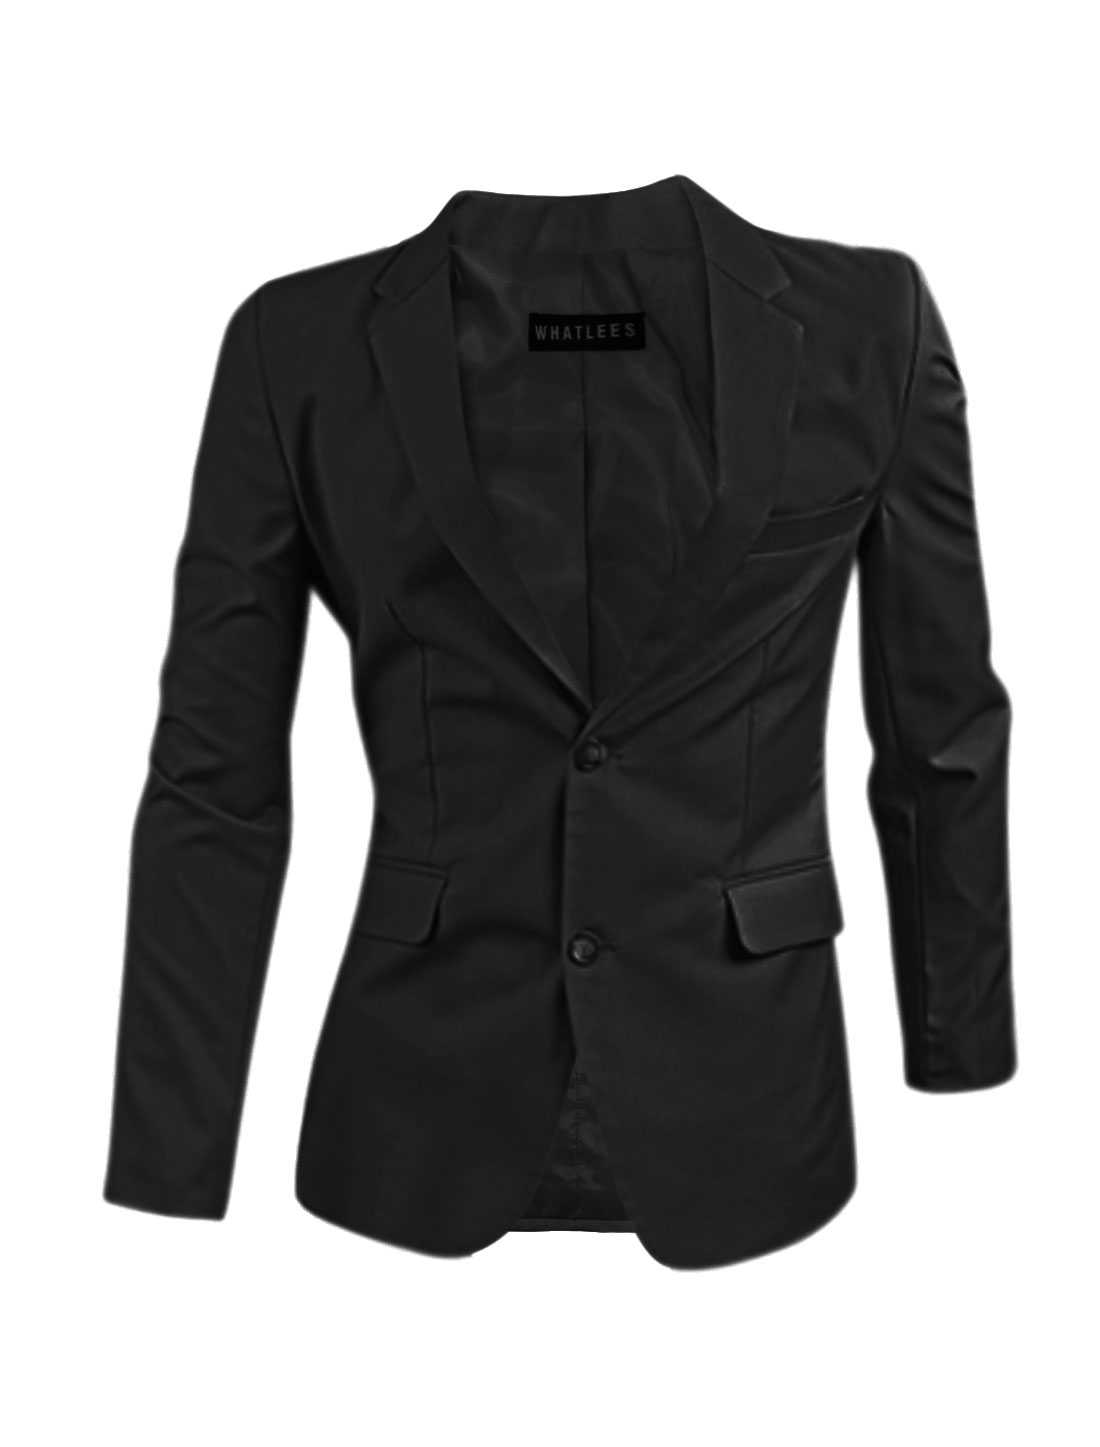 Men Flap Pockets Notched Lapel Split Sides Blazer Jacket Black M